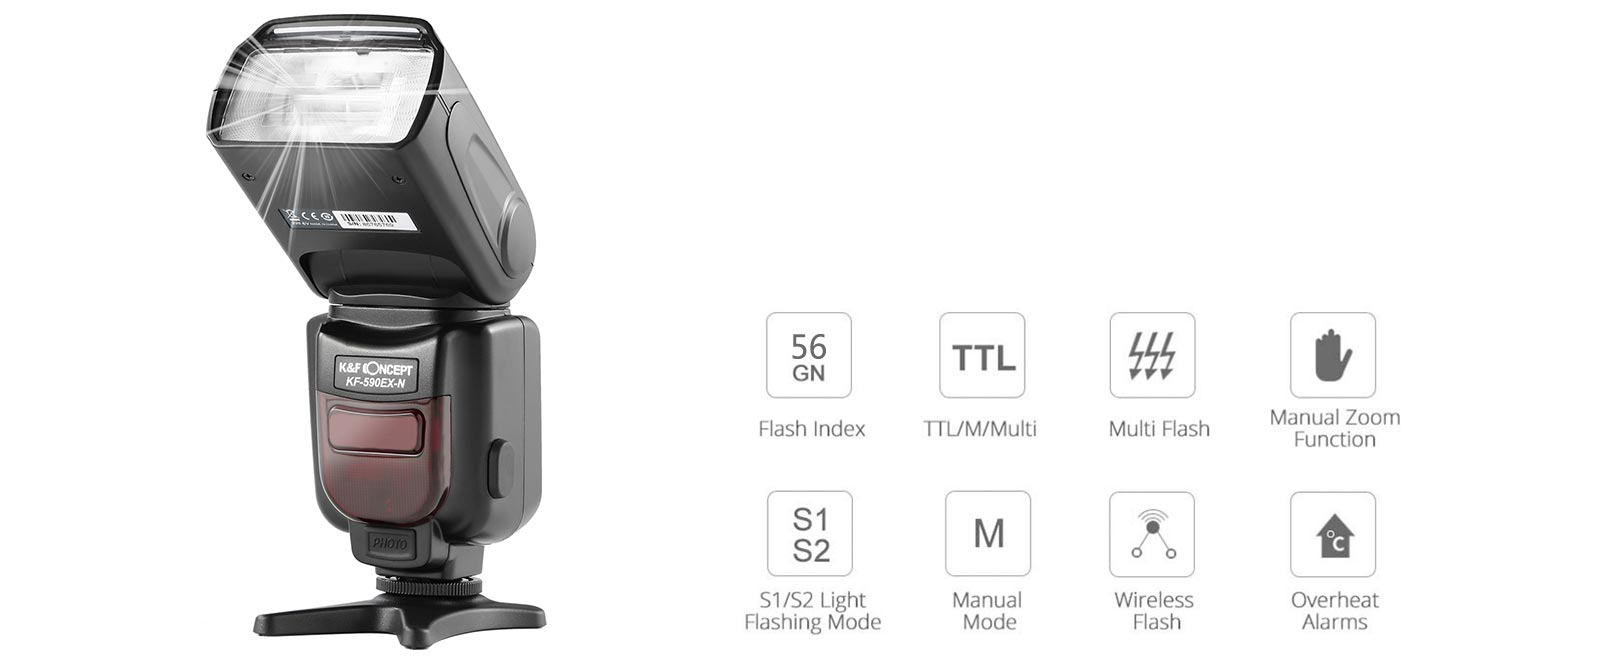 K&F Concept KF590N I-TTL Flash for Nikon GN56 Auto-Focus